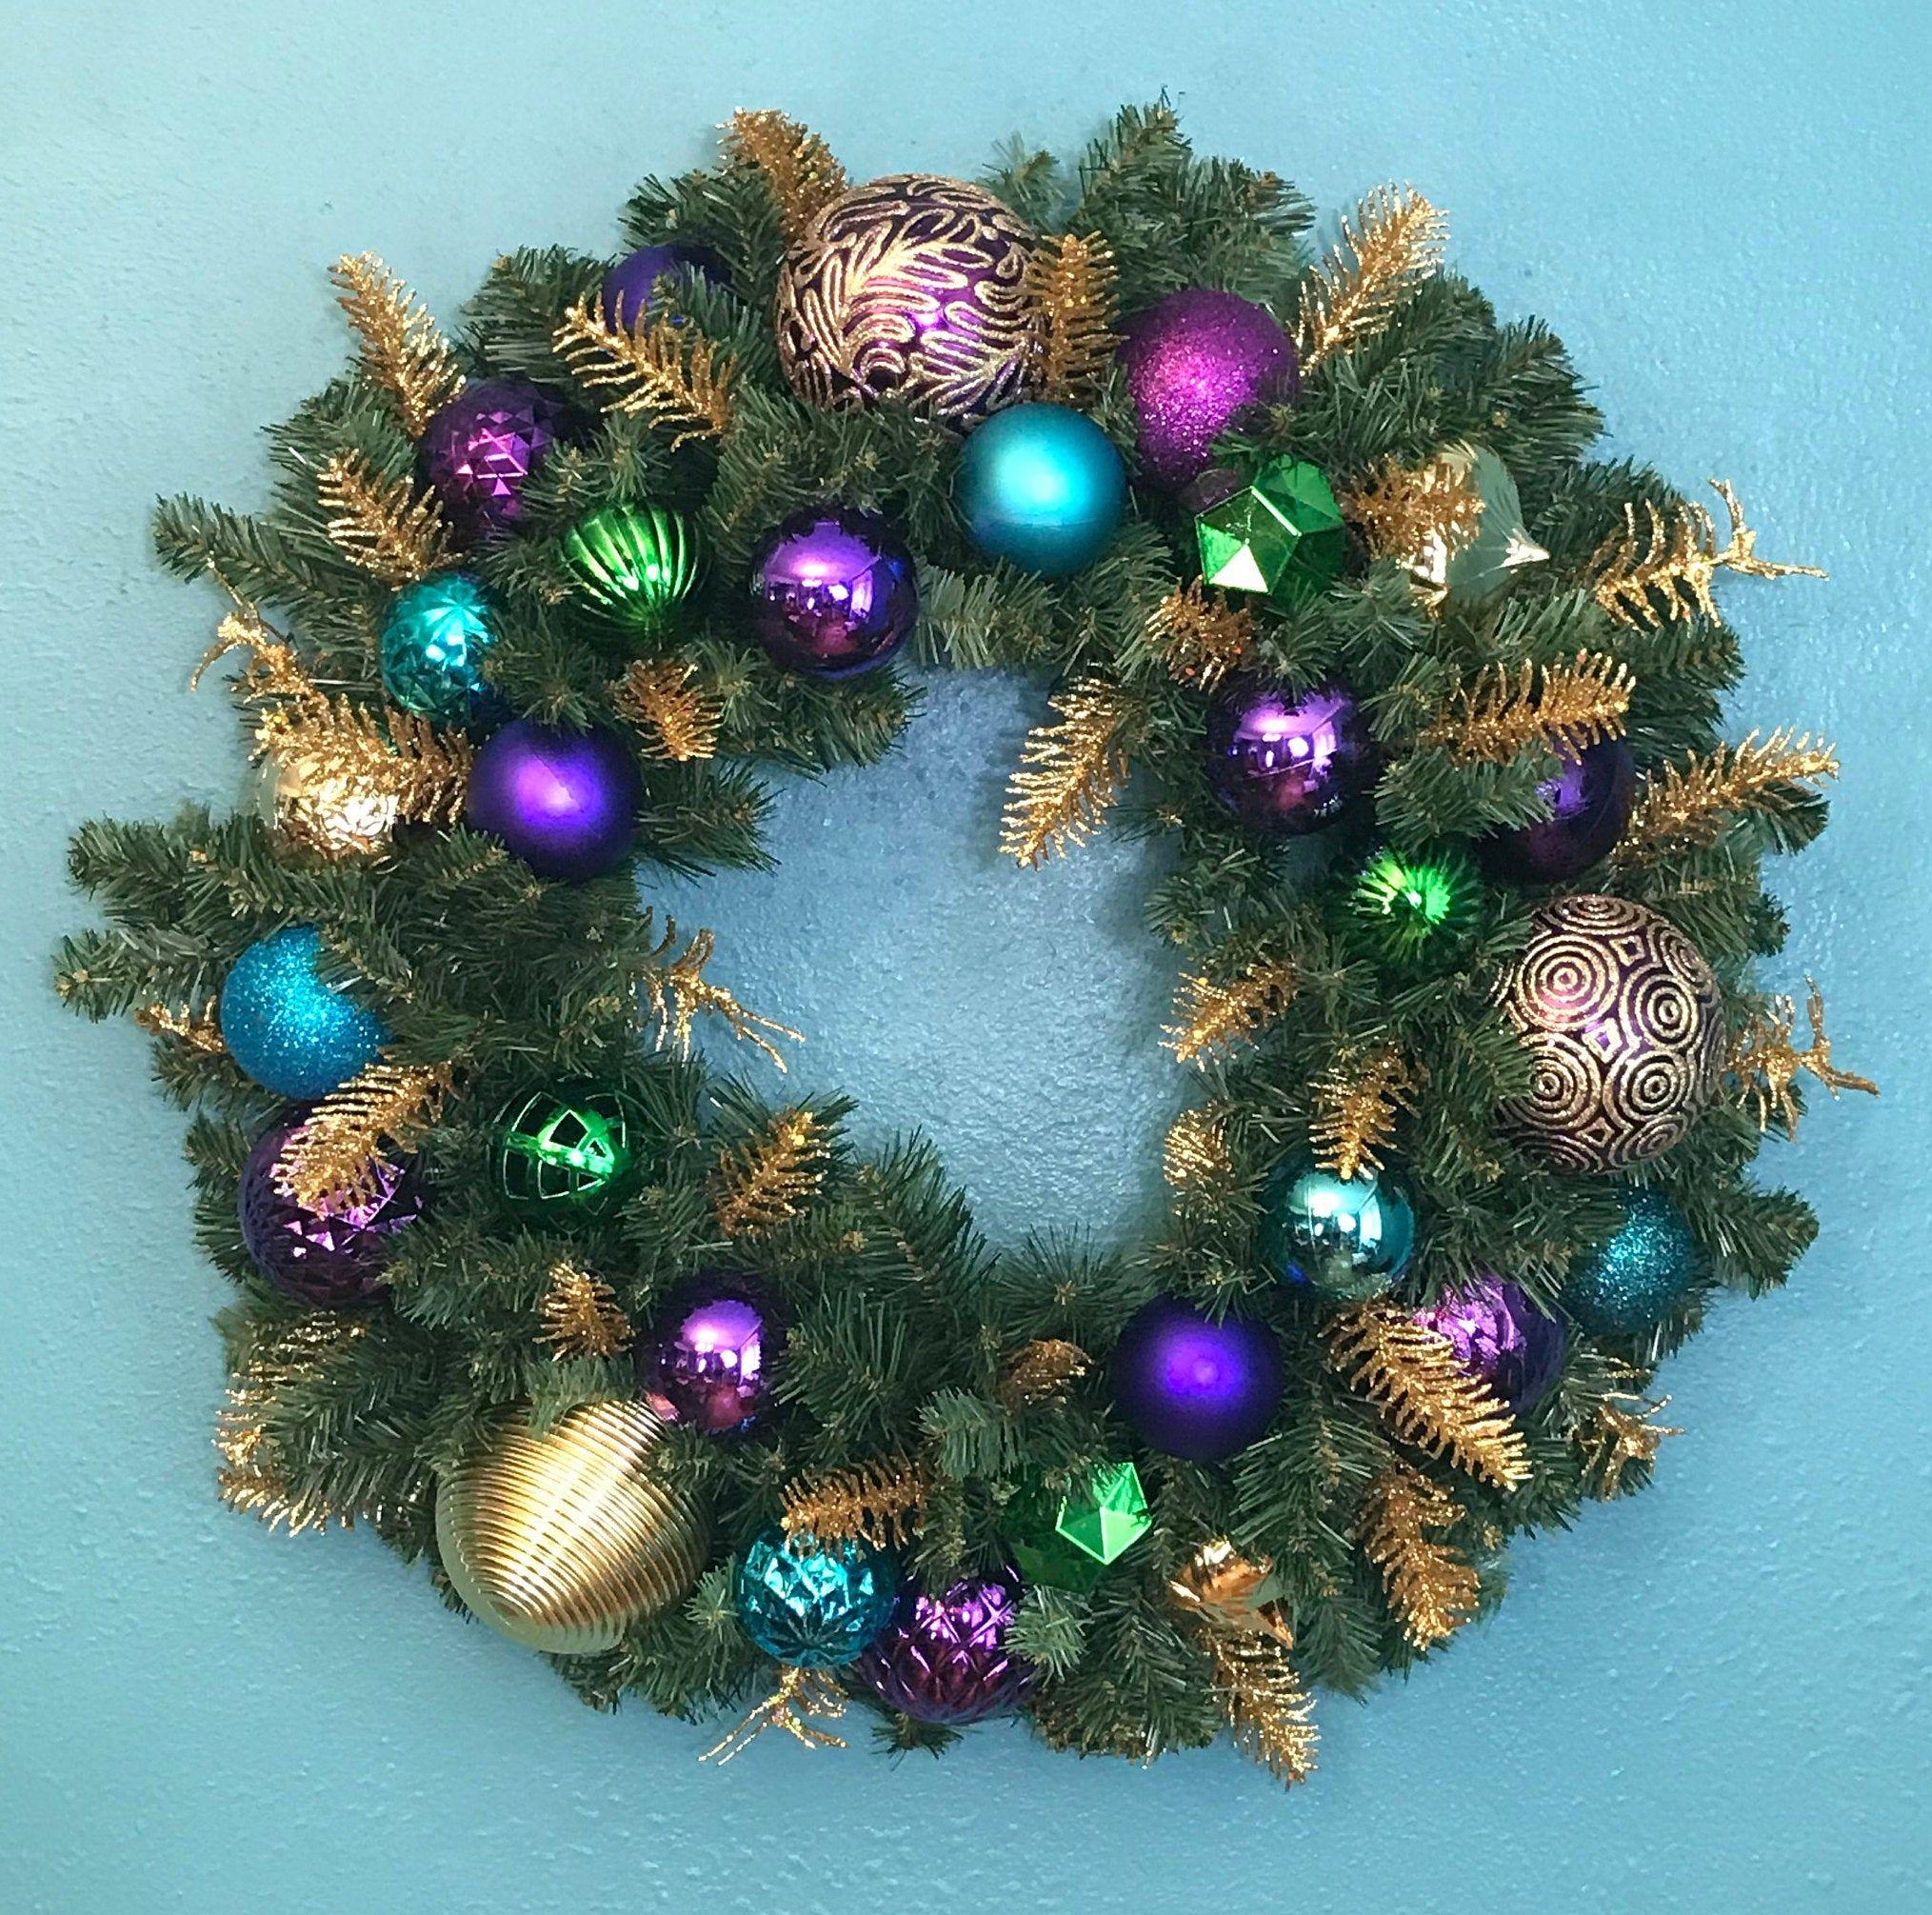 Sparkling Peacock Blue and Silver Christmas Door Wreath-Faux Evergreen Peacock Wreath-Peacock Silver Holiday Decor-Christmas Door Wreath